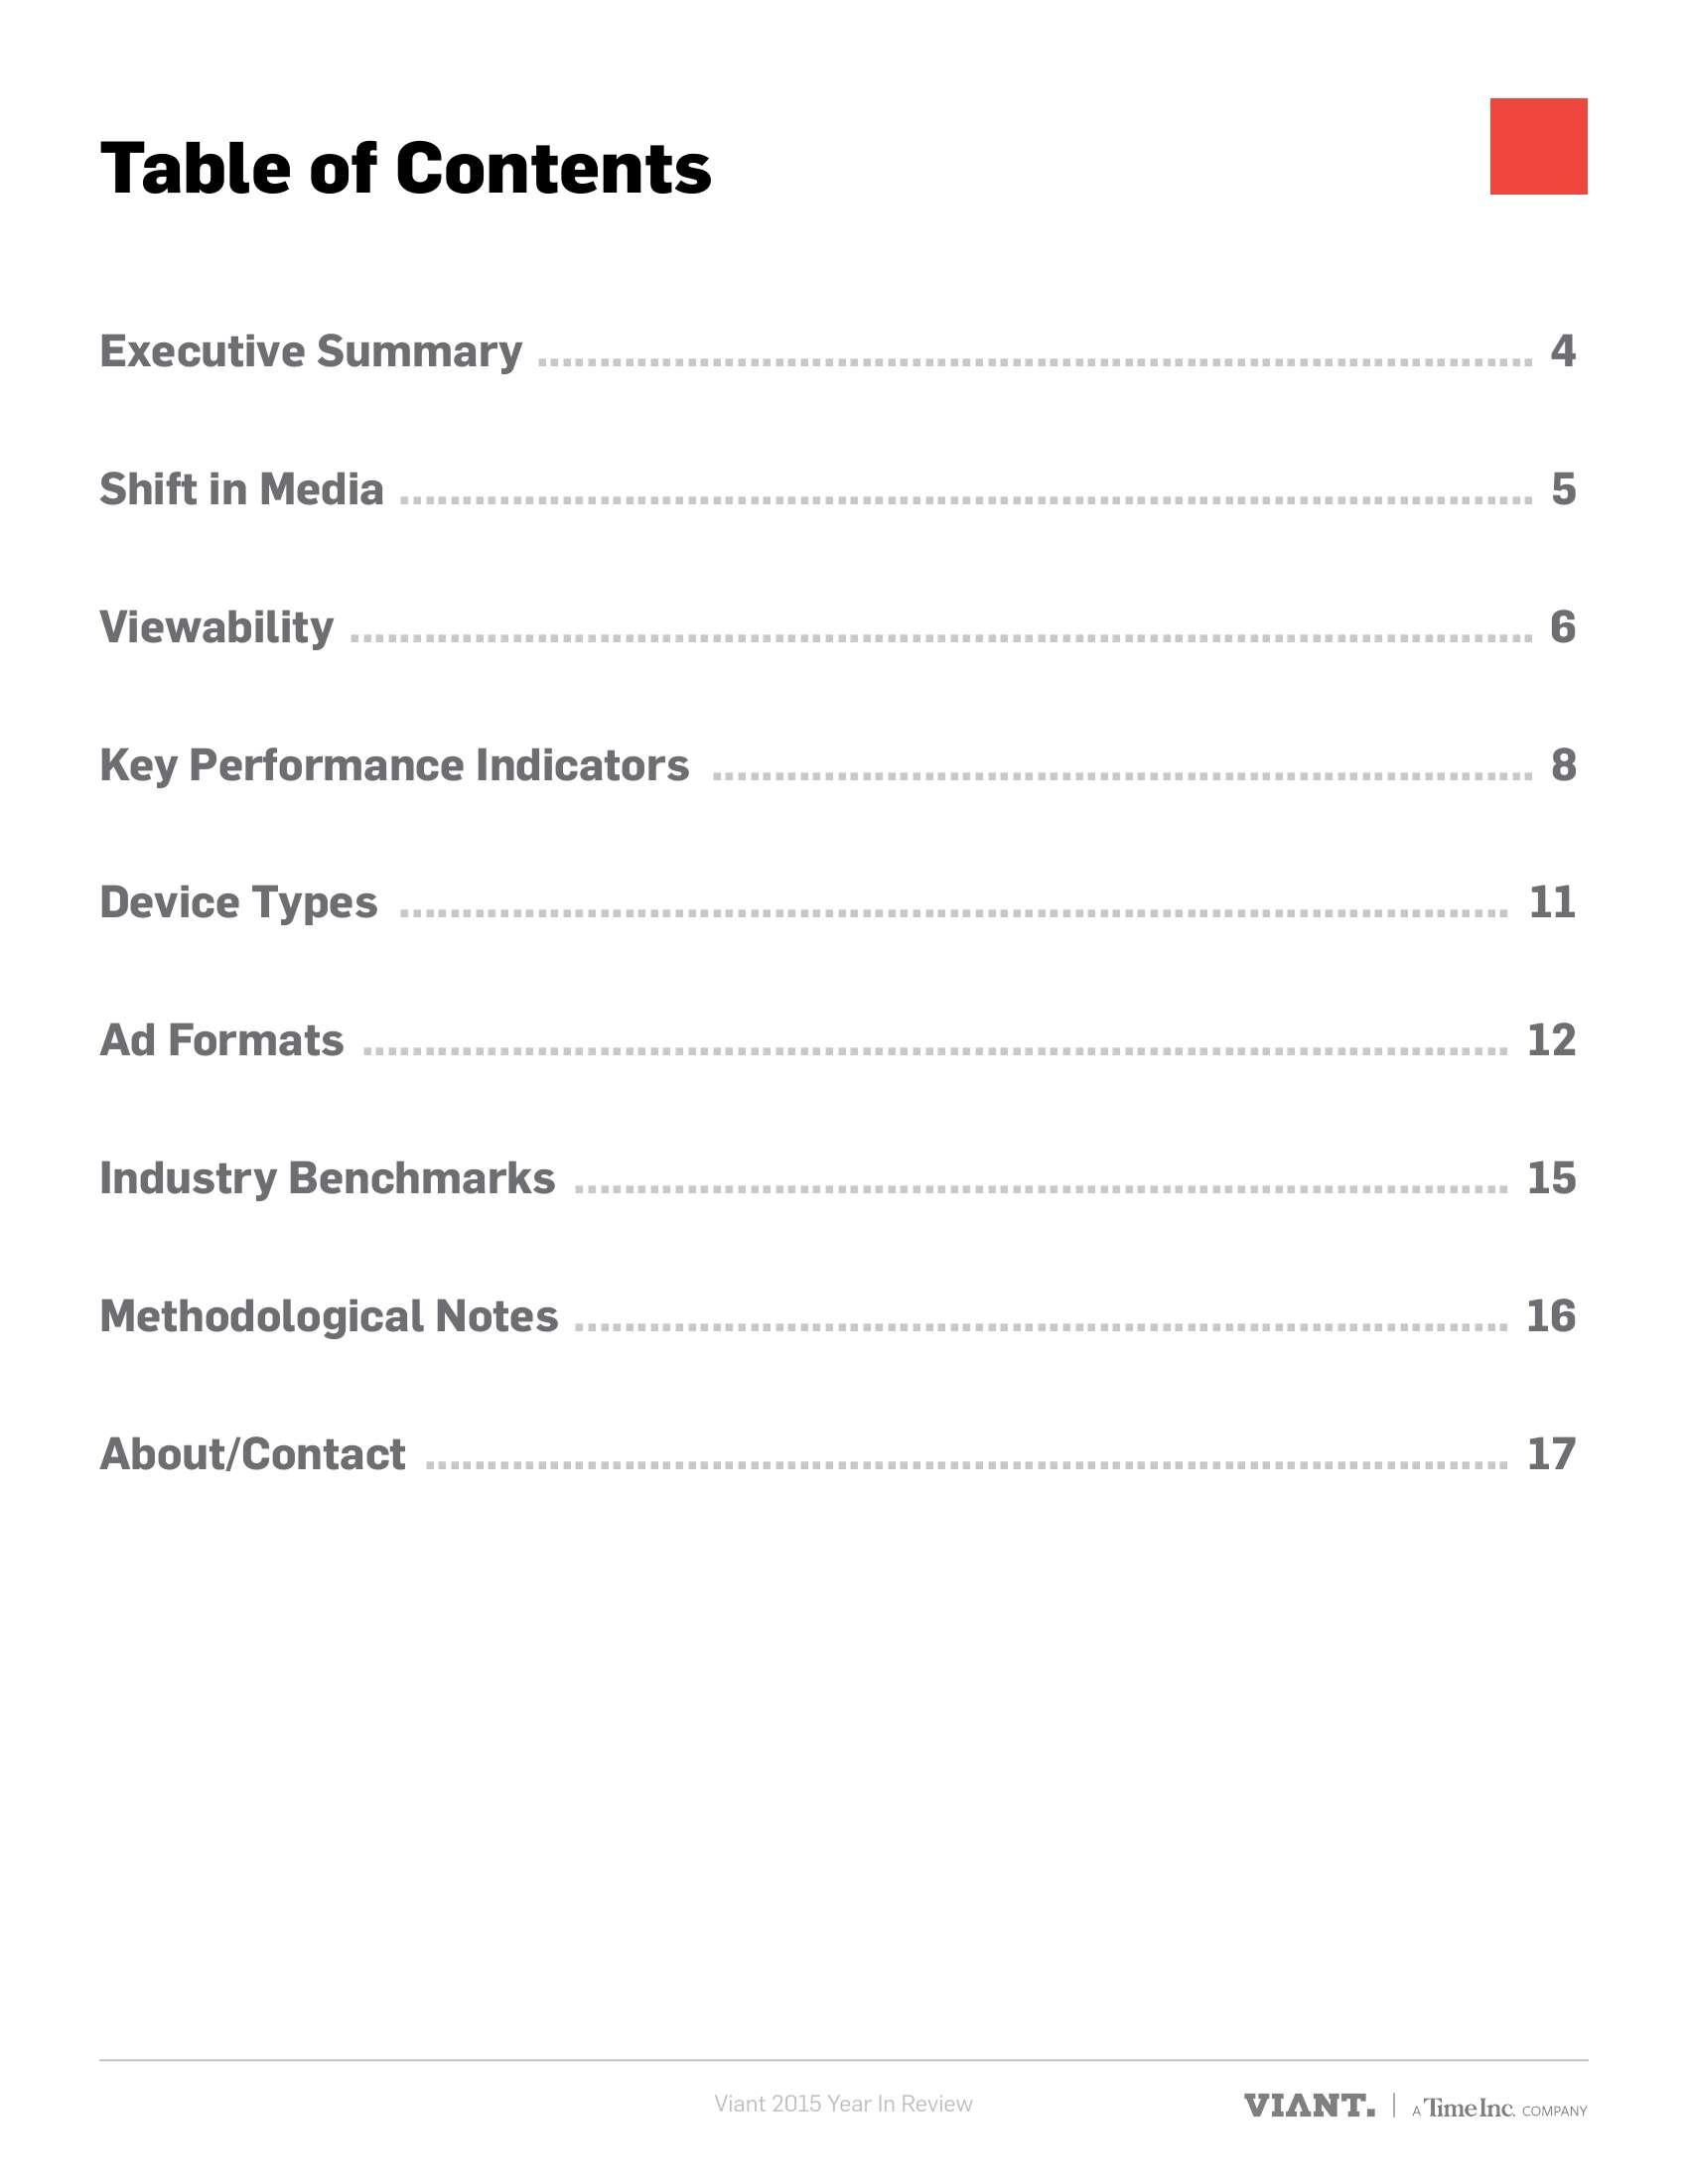 Viant:2015年视频广告趋势分析报告_000003